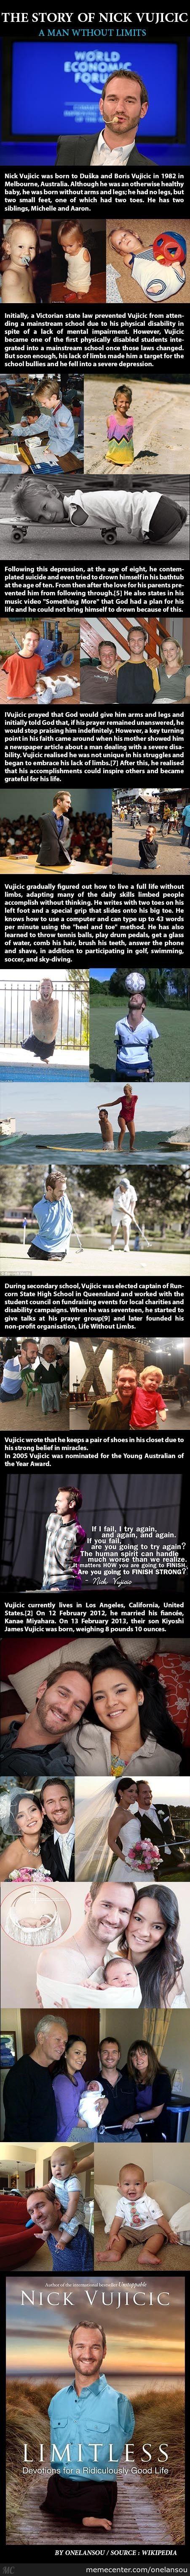 The Story of Nick Vujicic